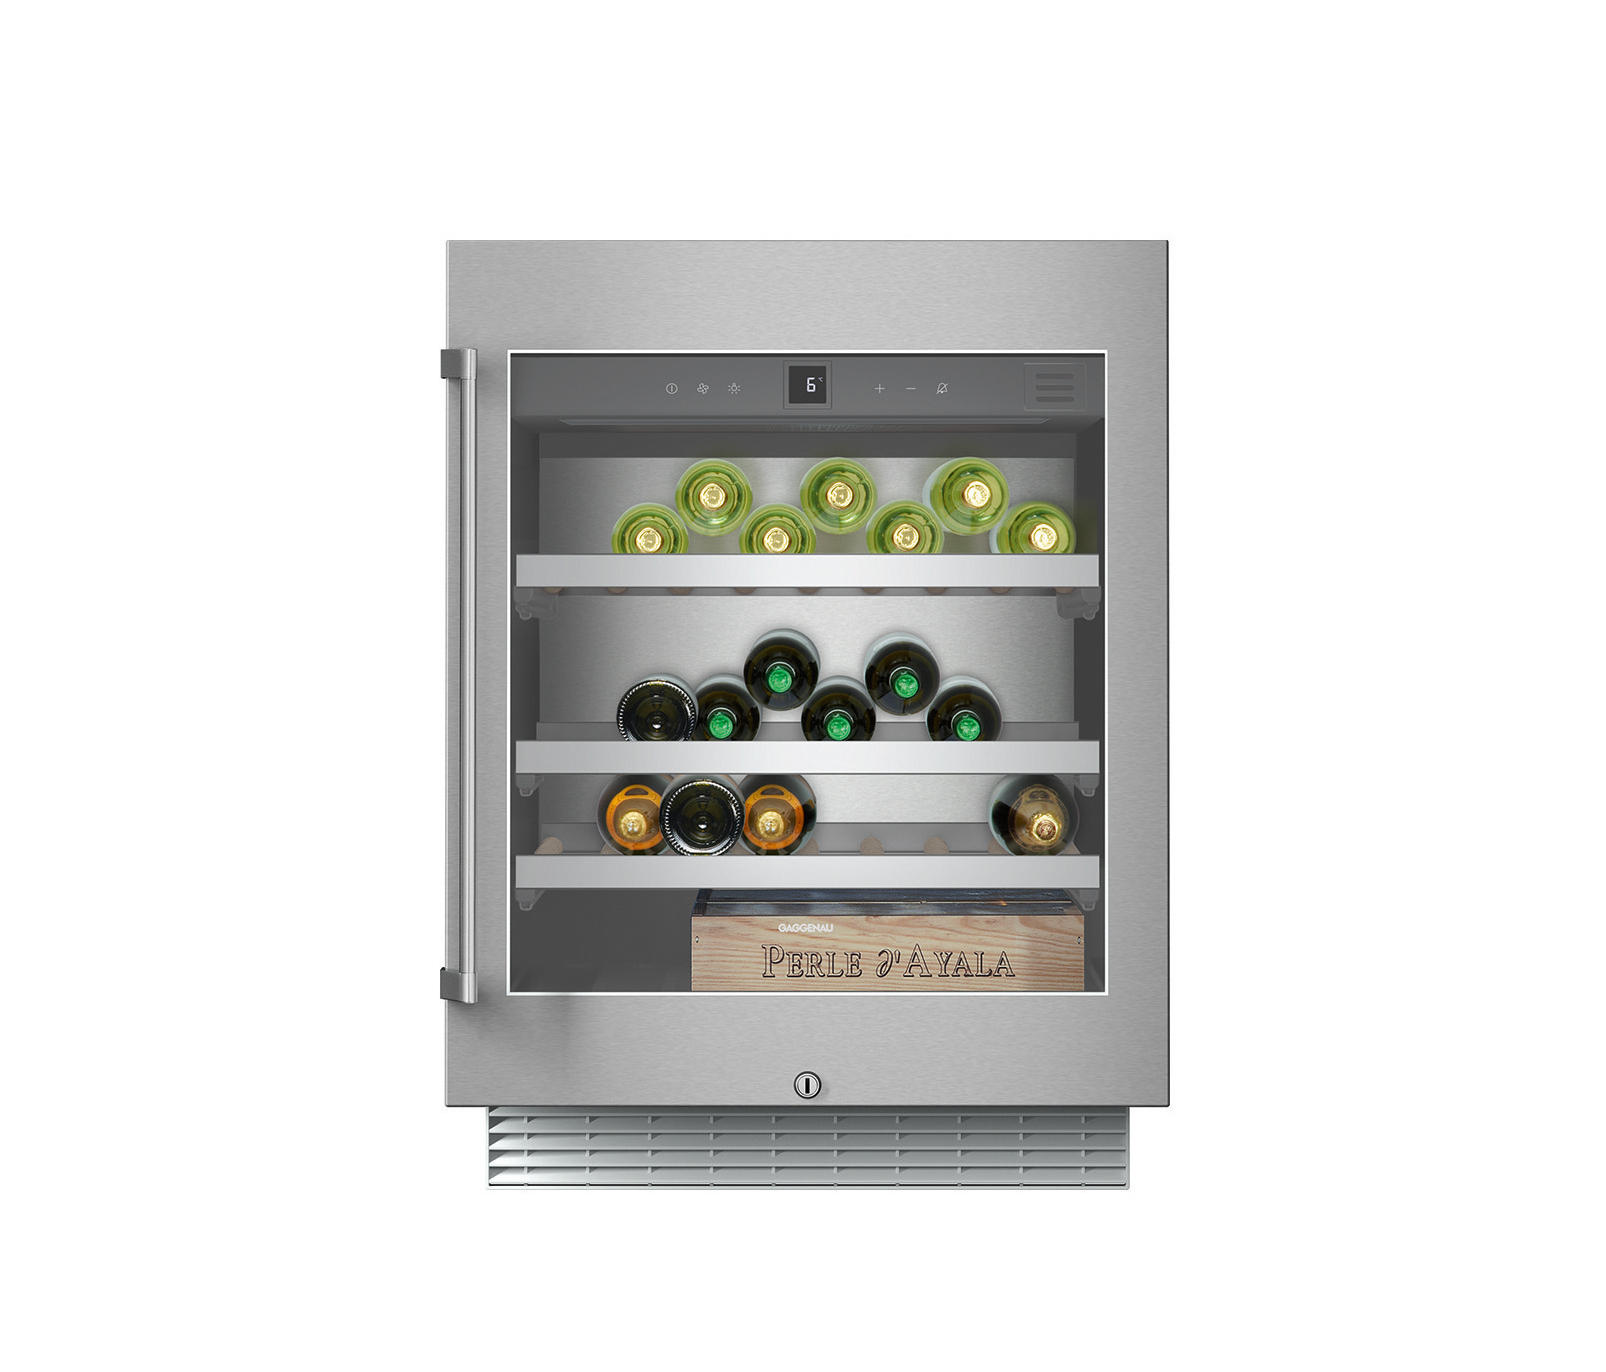 conservador de vino vario serie 400 rw 402 frigor ficos neveras de gaggenau architonic. Black Bedroom Furniture Sets. Home Design Ideas